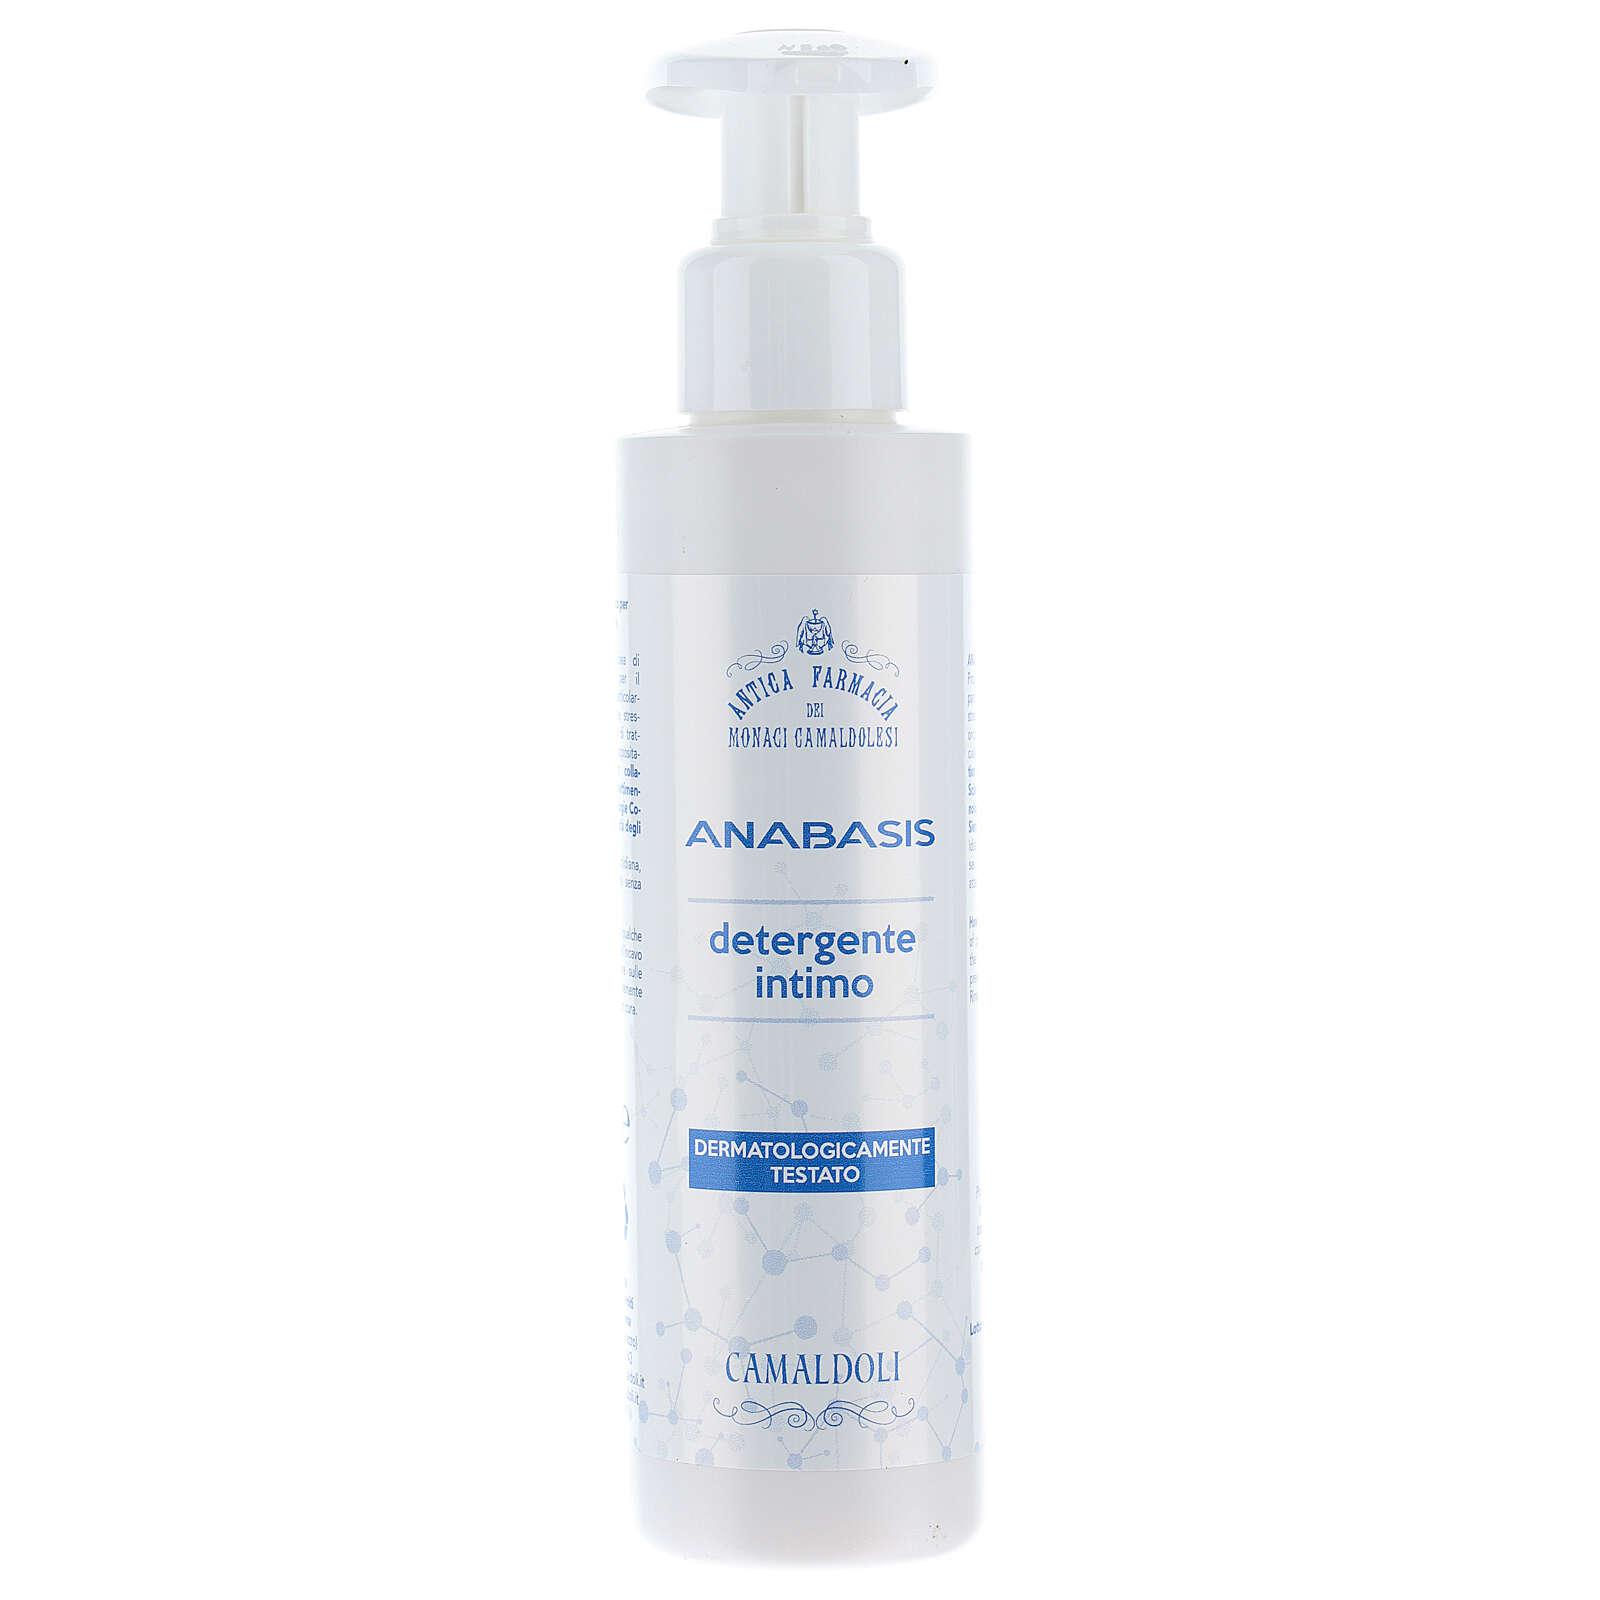 Intimate soap 150 ml Camaldoli Anabasis line 4